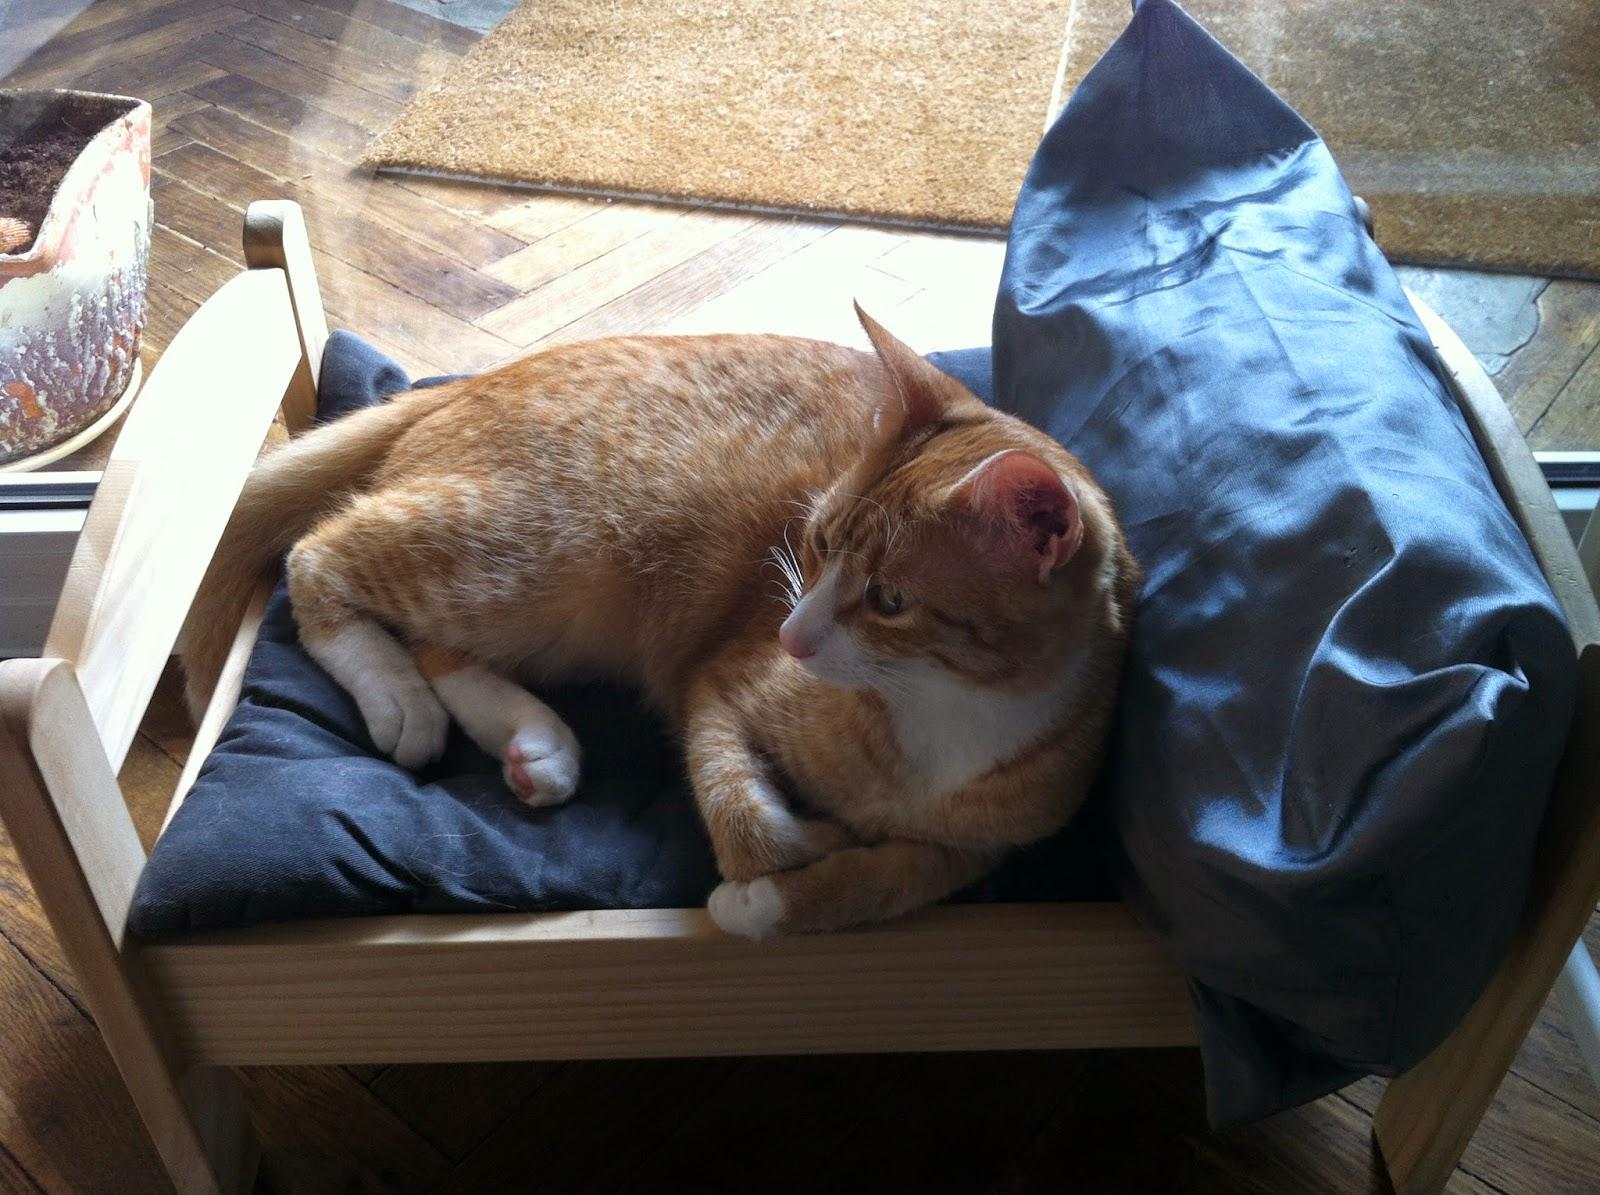 an orange cat sleeping in a cat bed